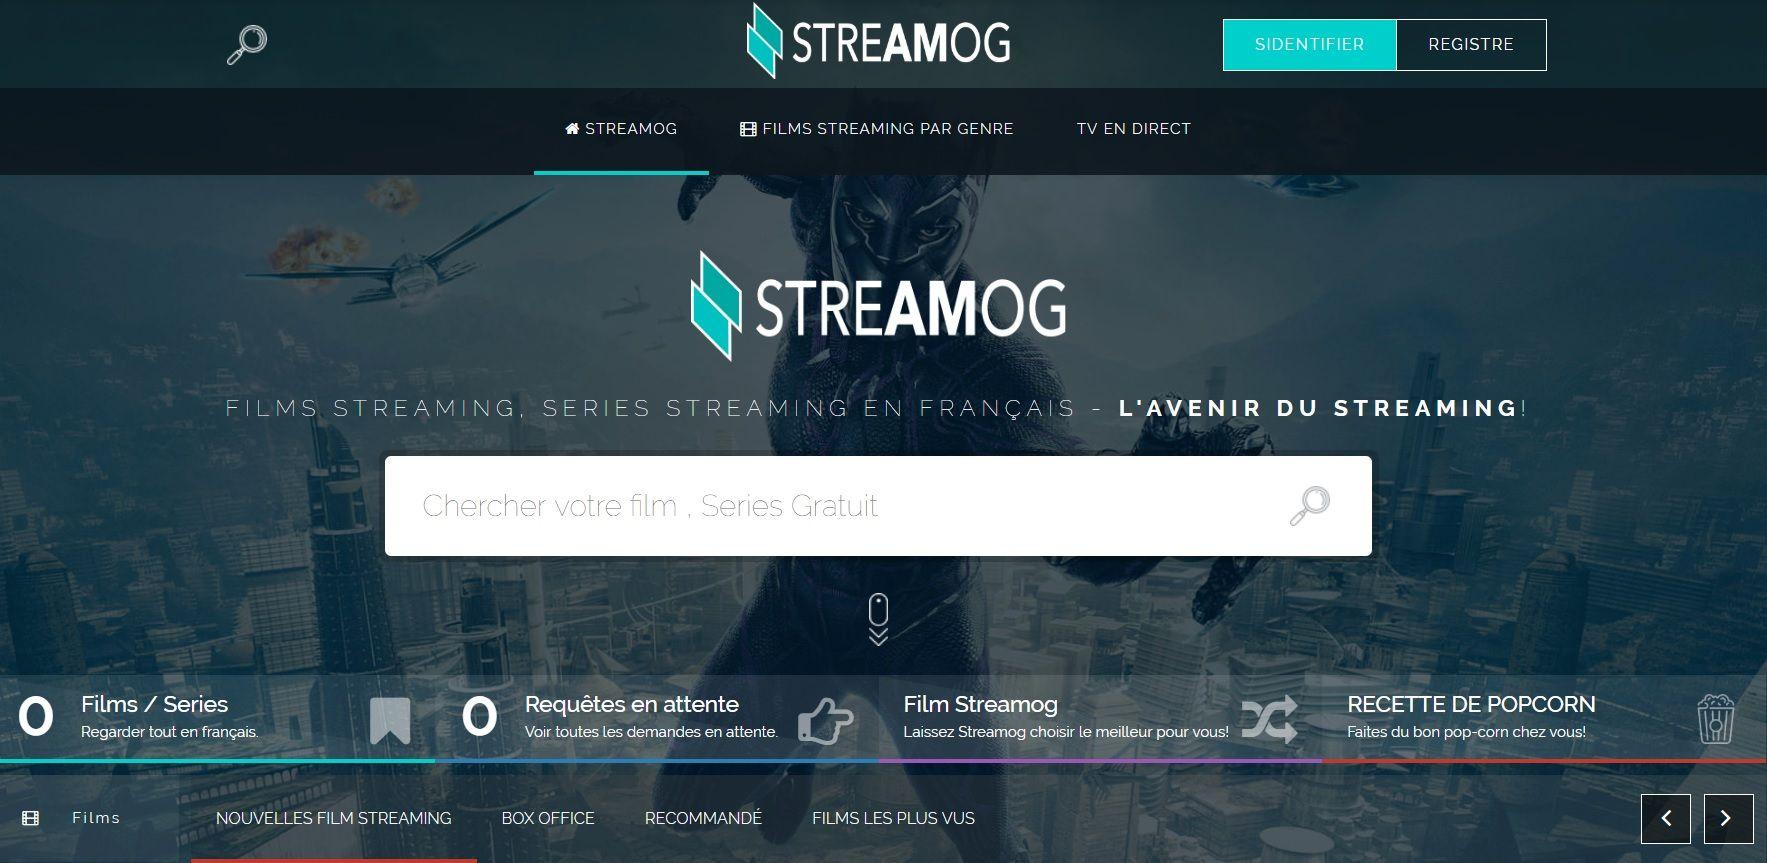 Streamog Accueil Comment Regarder un Film Complet en streaming – Streamog Avis